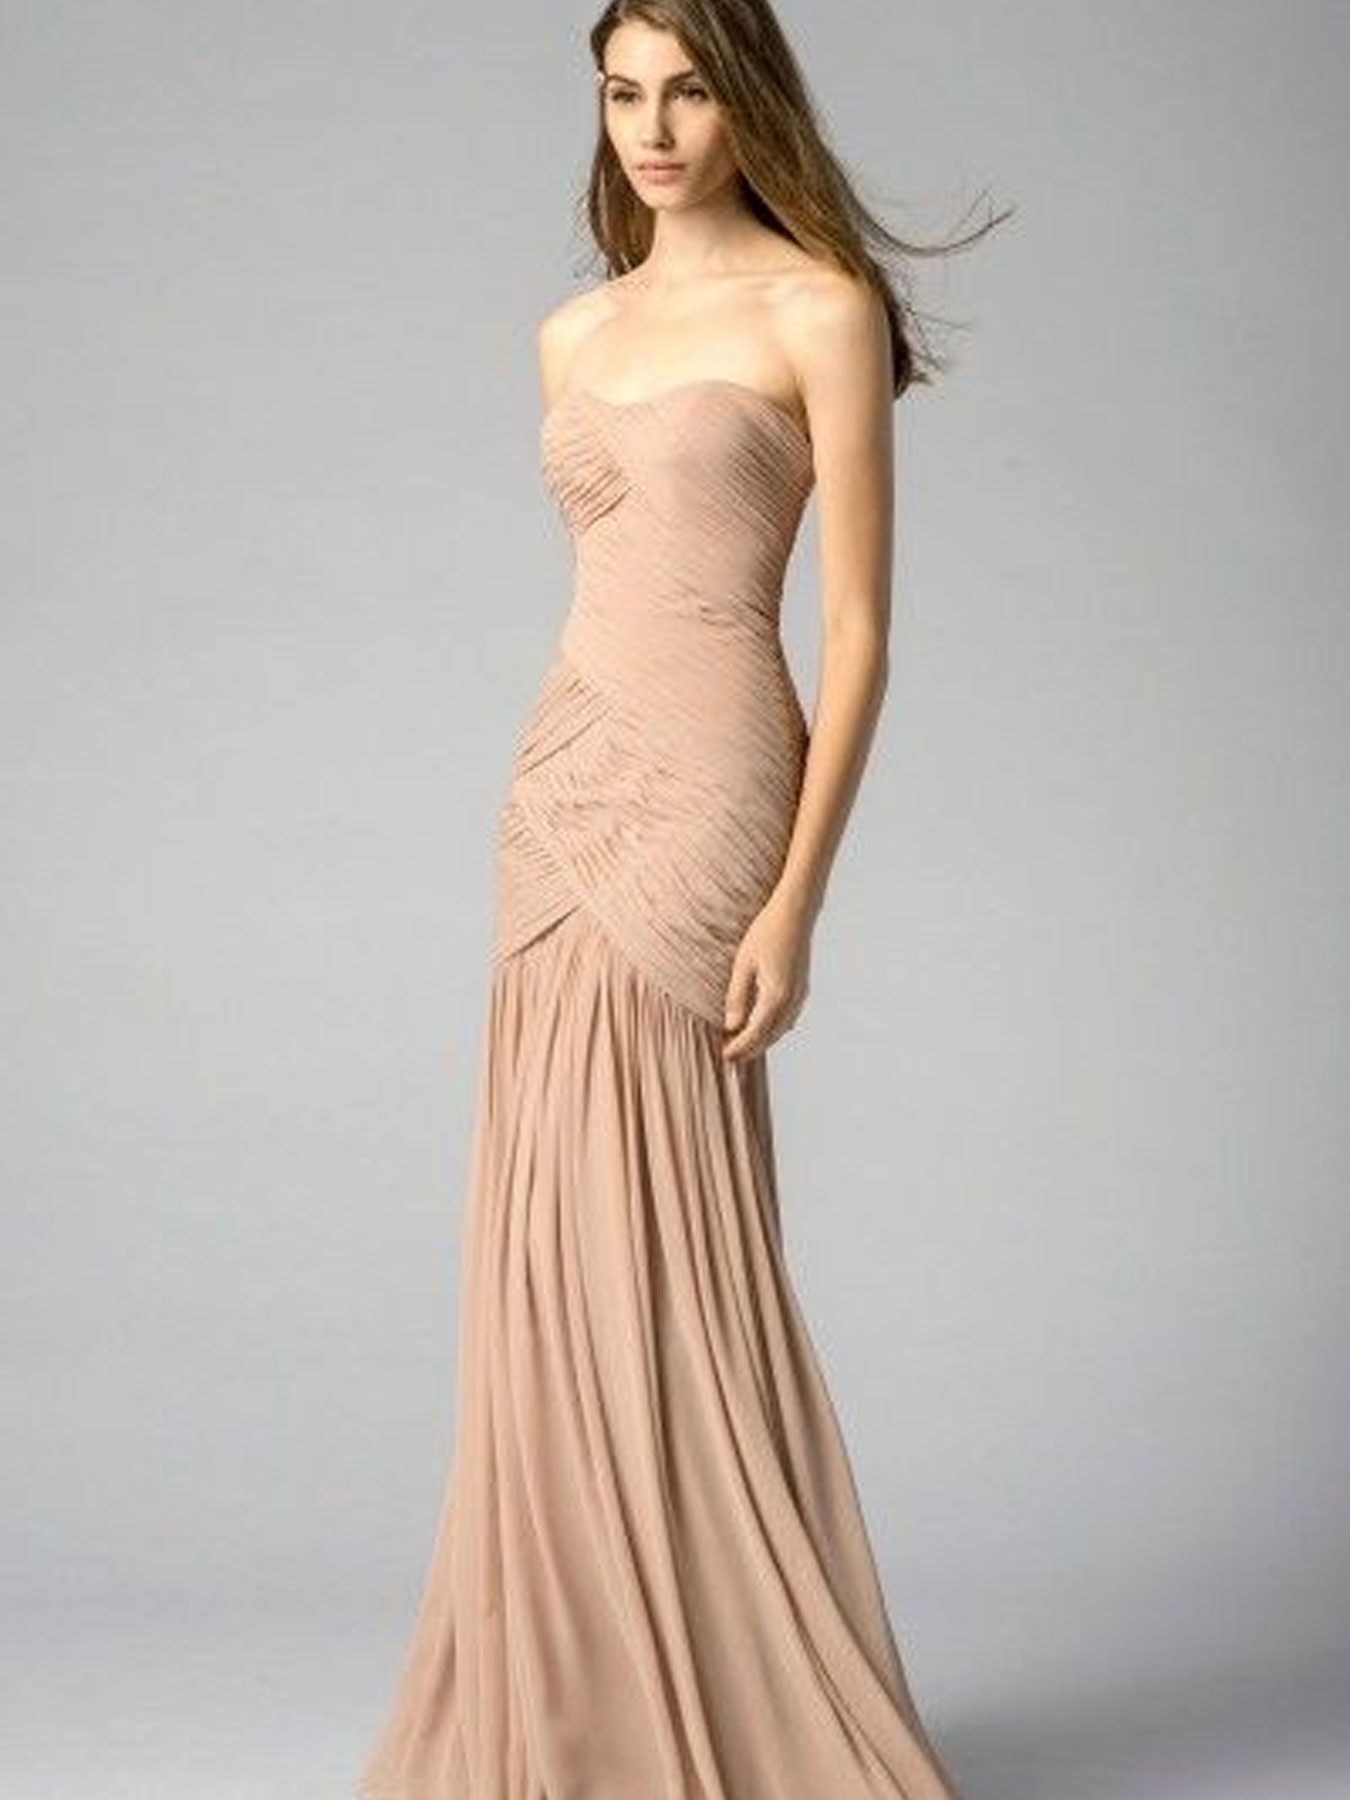 Top 20 Bridesmaid Bouquet  Dress Color Combinations Of -9885